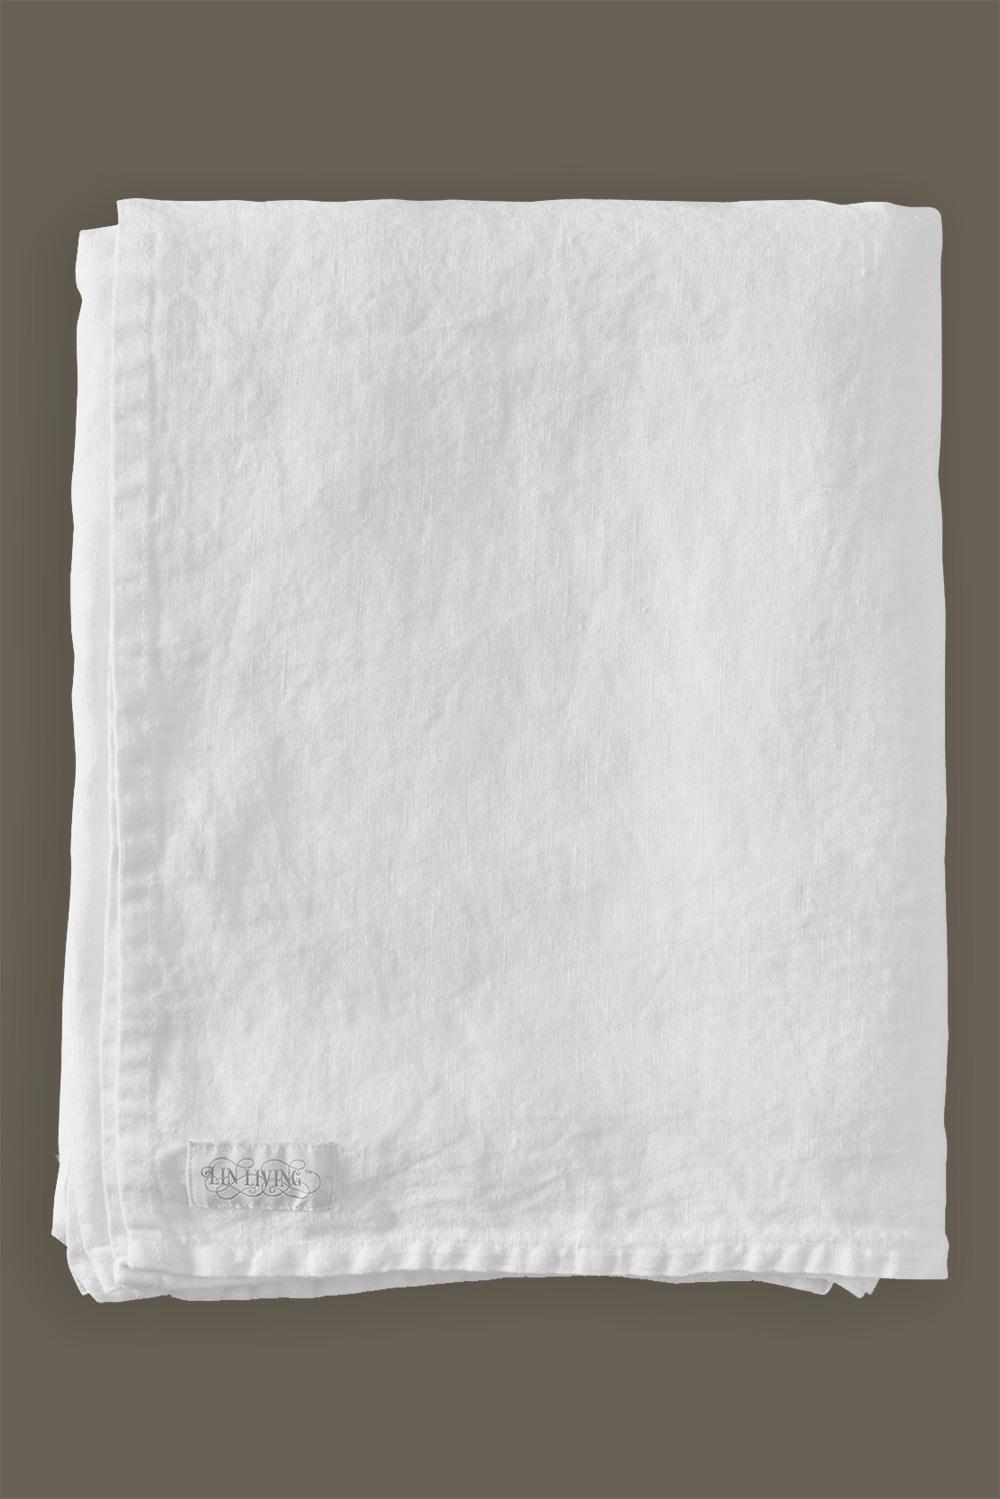 Underlakan White Washed Linen